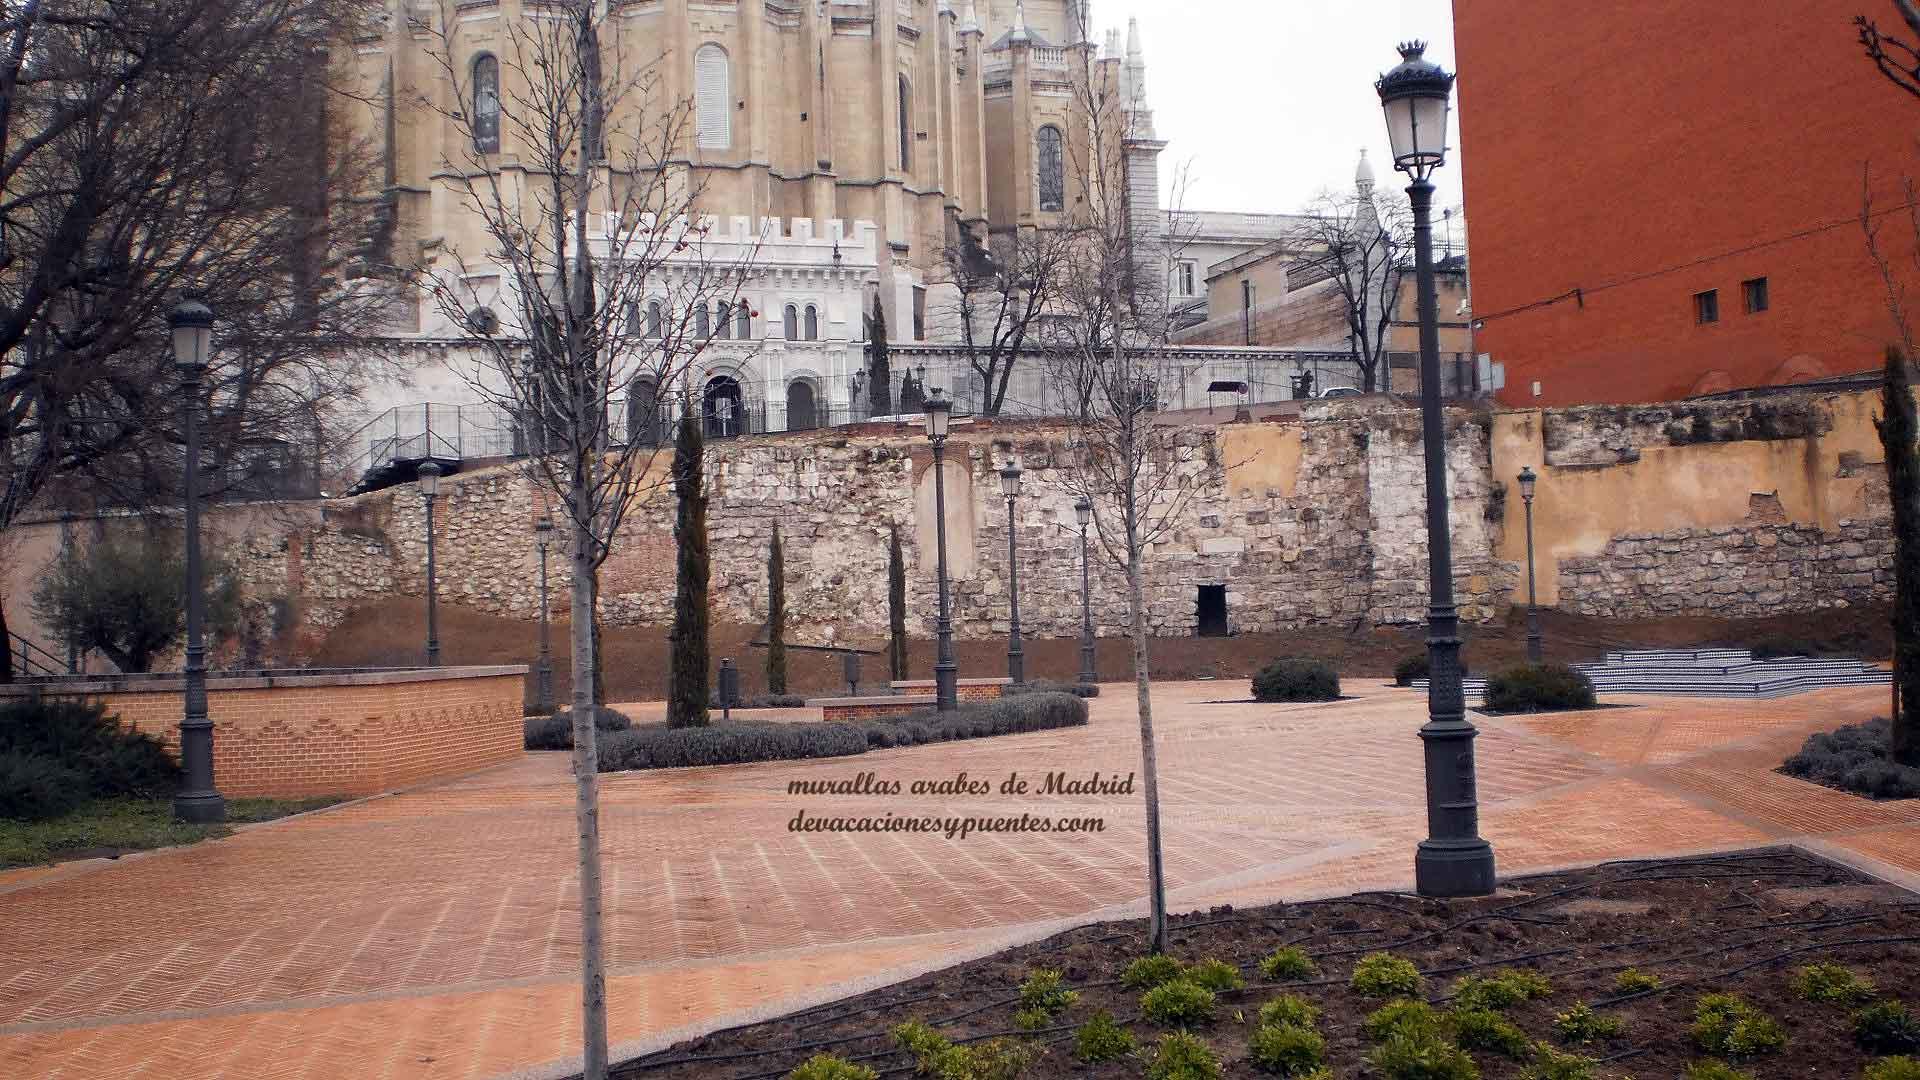 2013-madrid-medieval-26.jpg